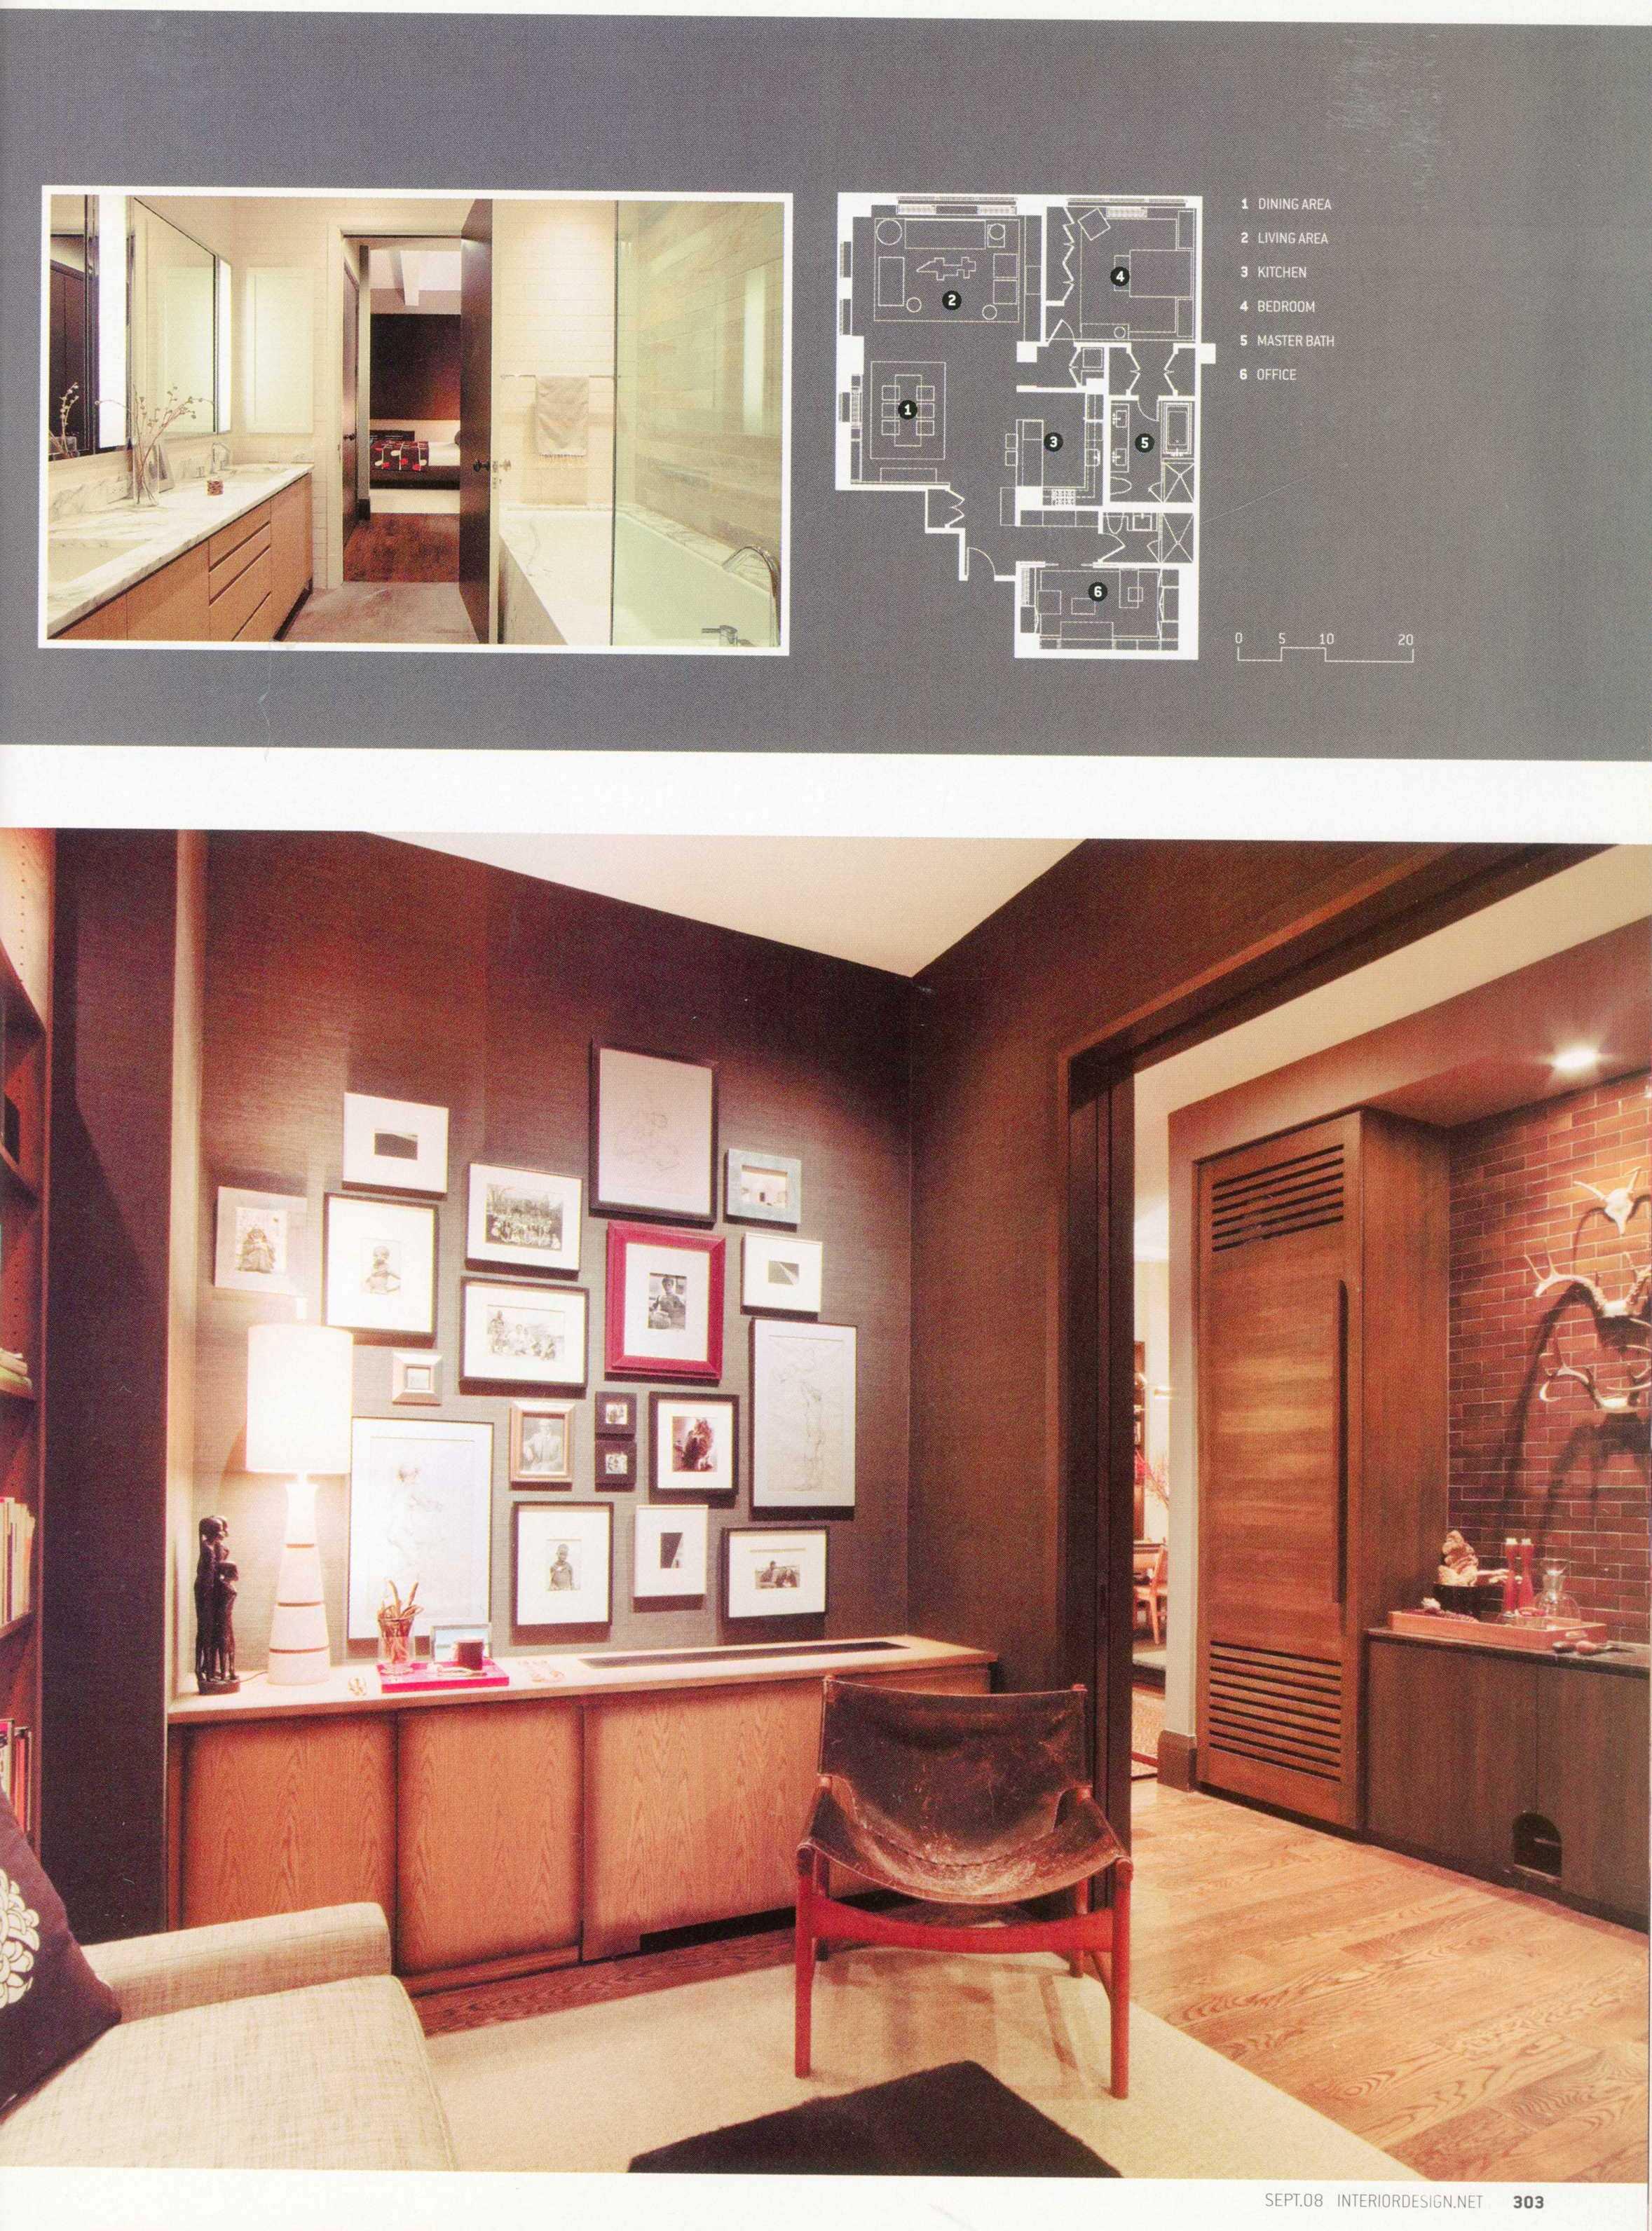 Interior Design_Sept 08_SS Apt_Full Article_Page_9.jpg